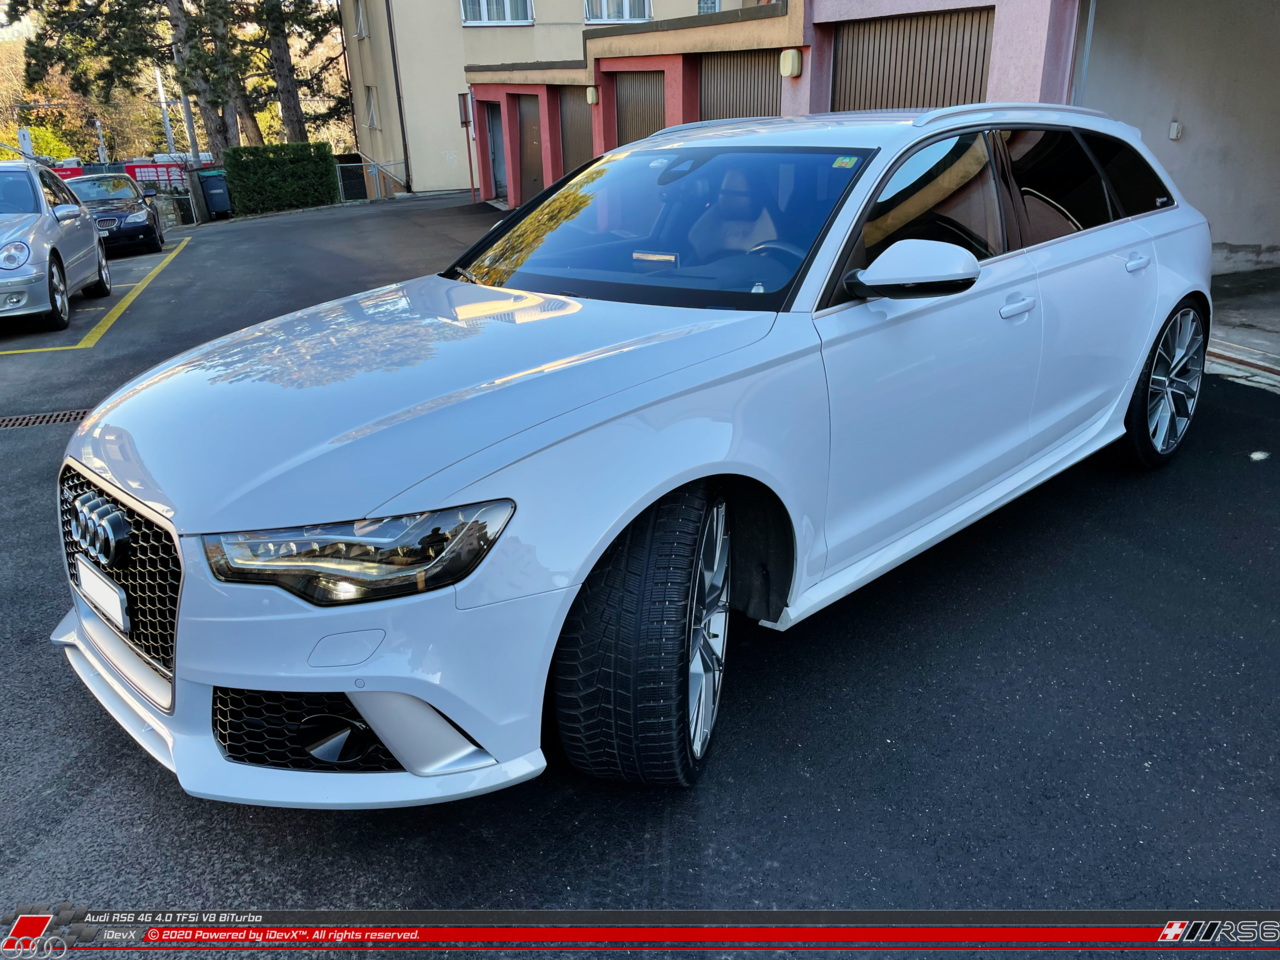 21.02.2021_Audi-RS6_iDevX_000.png